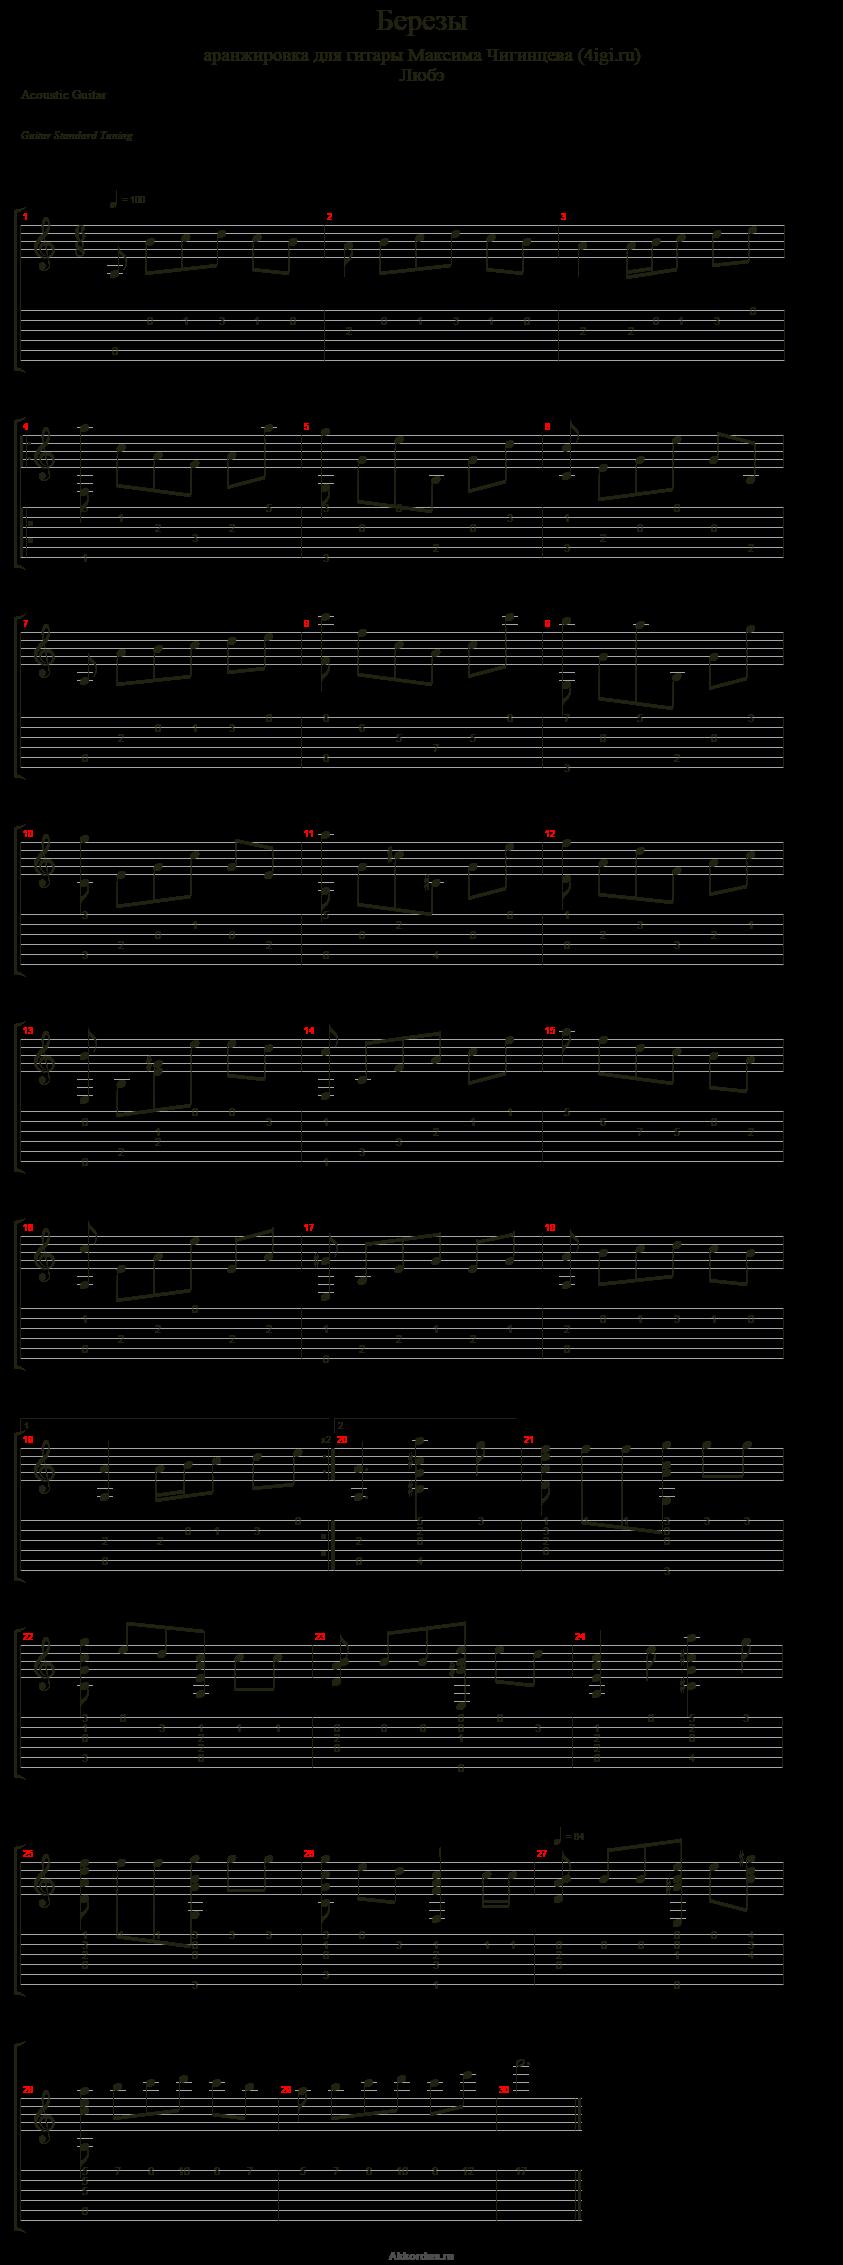 vse-konchaetsya-akkordi-tabulaturi